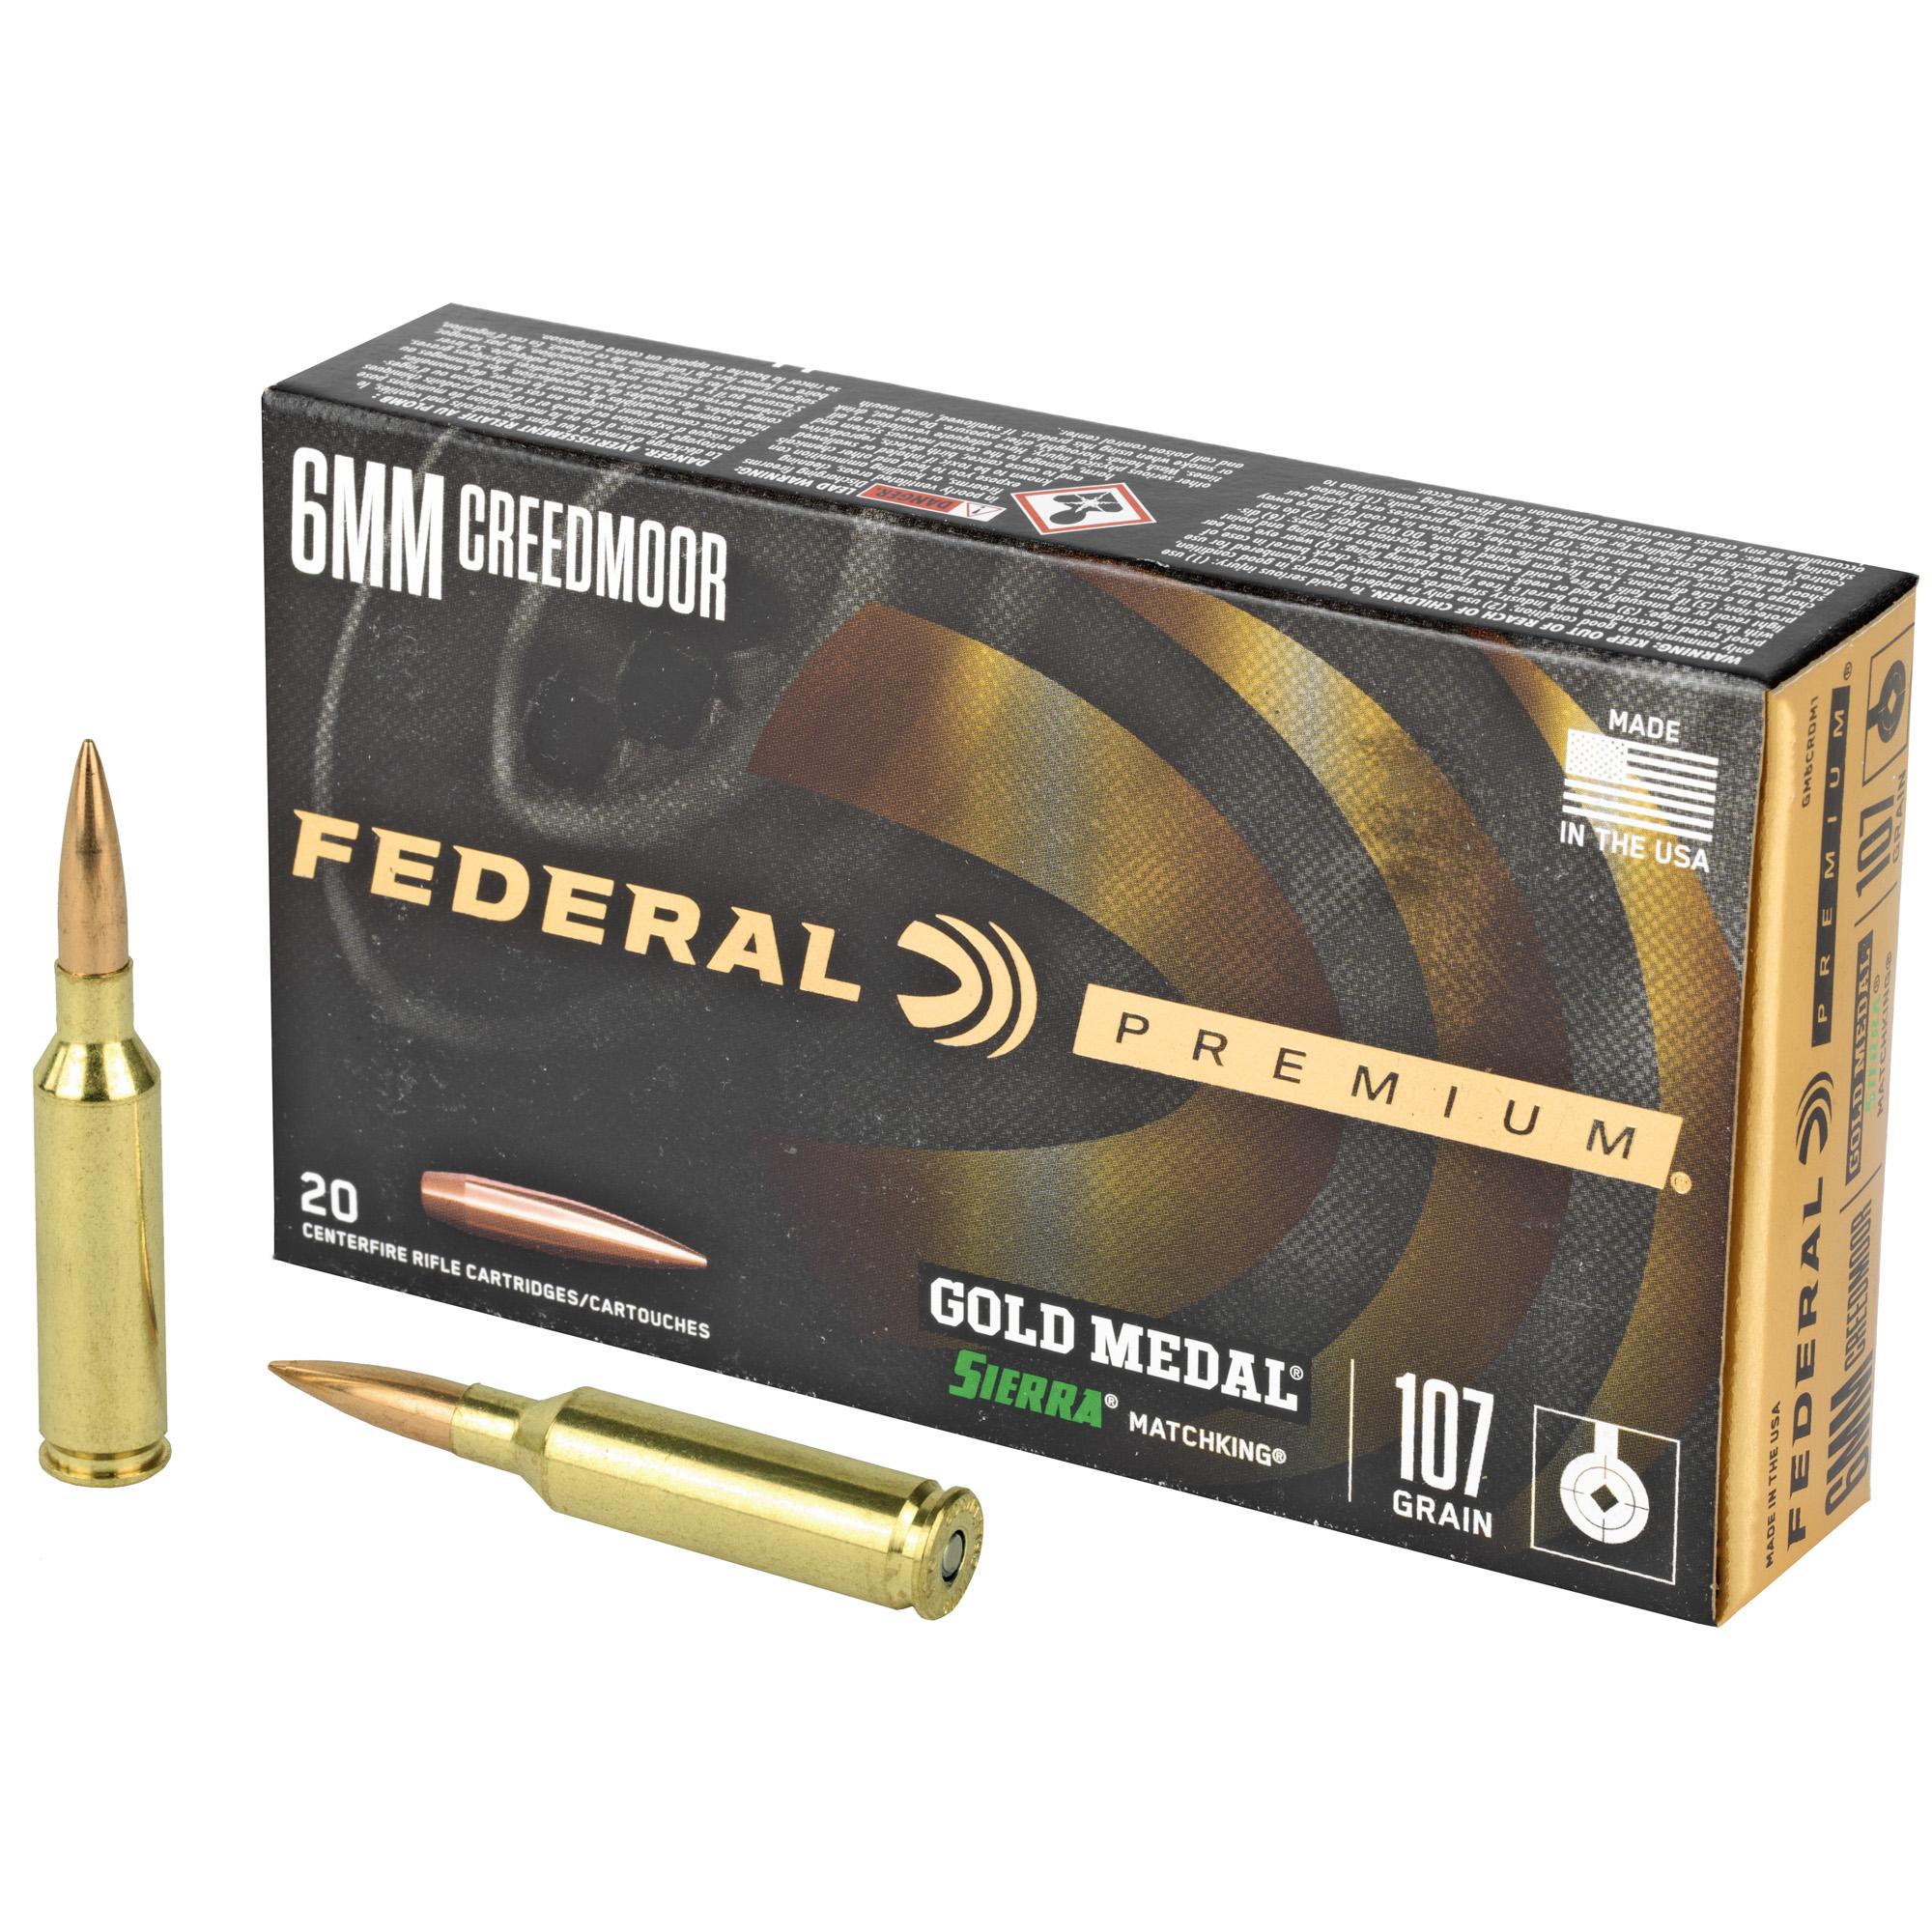 Fed Gold Mdl 6mmcrd 107gr Smk 20/200